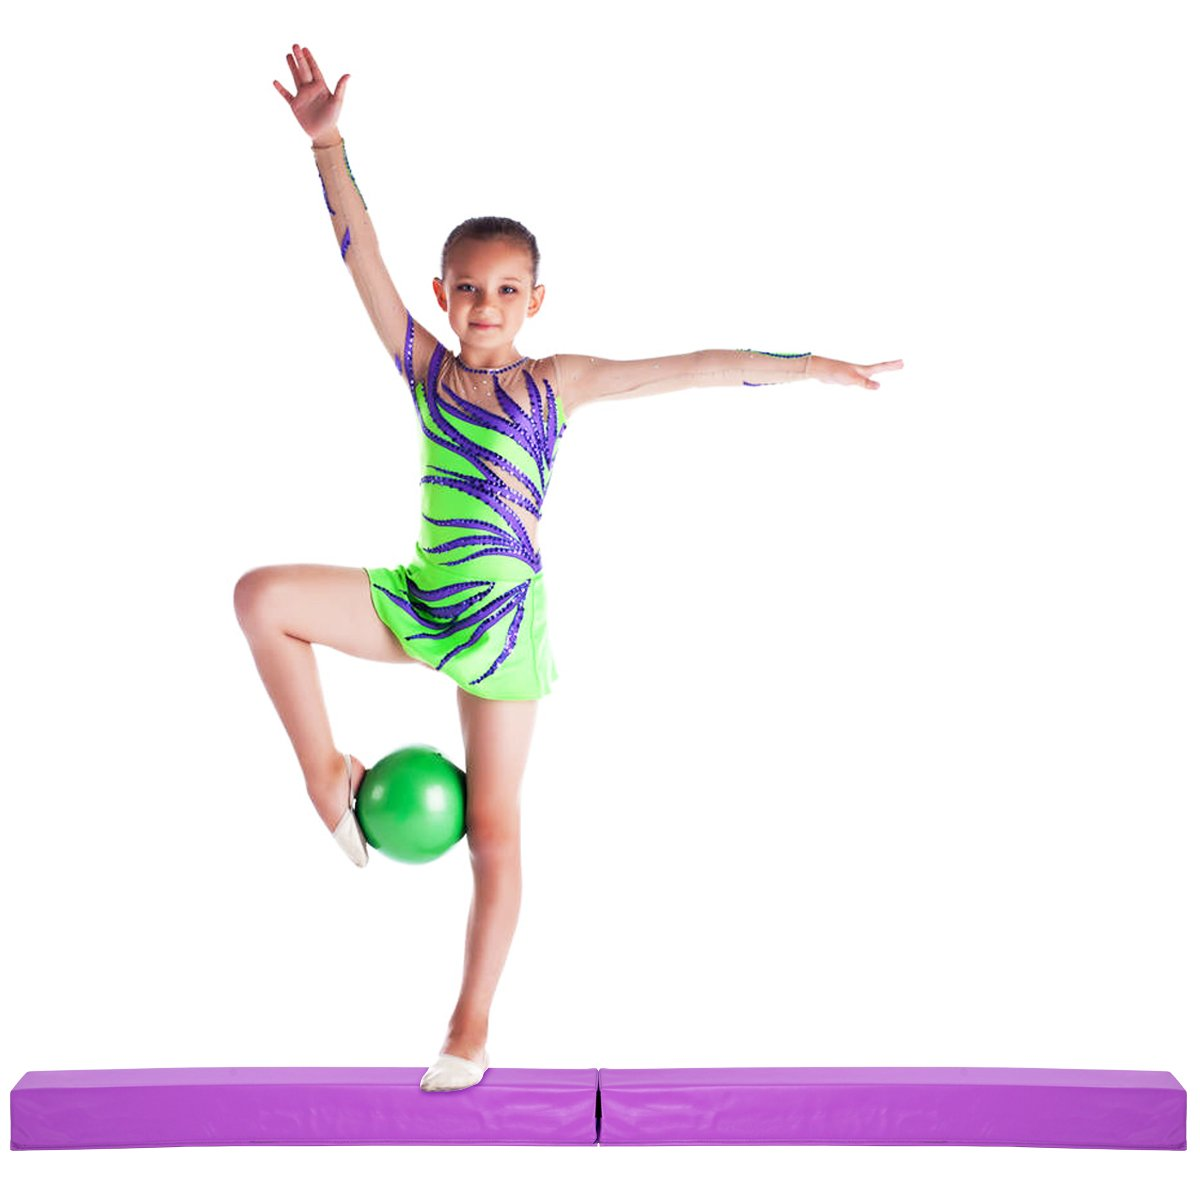 Giantex床バランスビーム体操機器for Beginners & Professional Gymnastsスキルパフォーマンストレーニング簡単ストレージ B079SY3QVV パープル